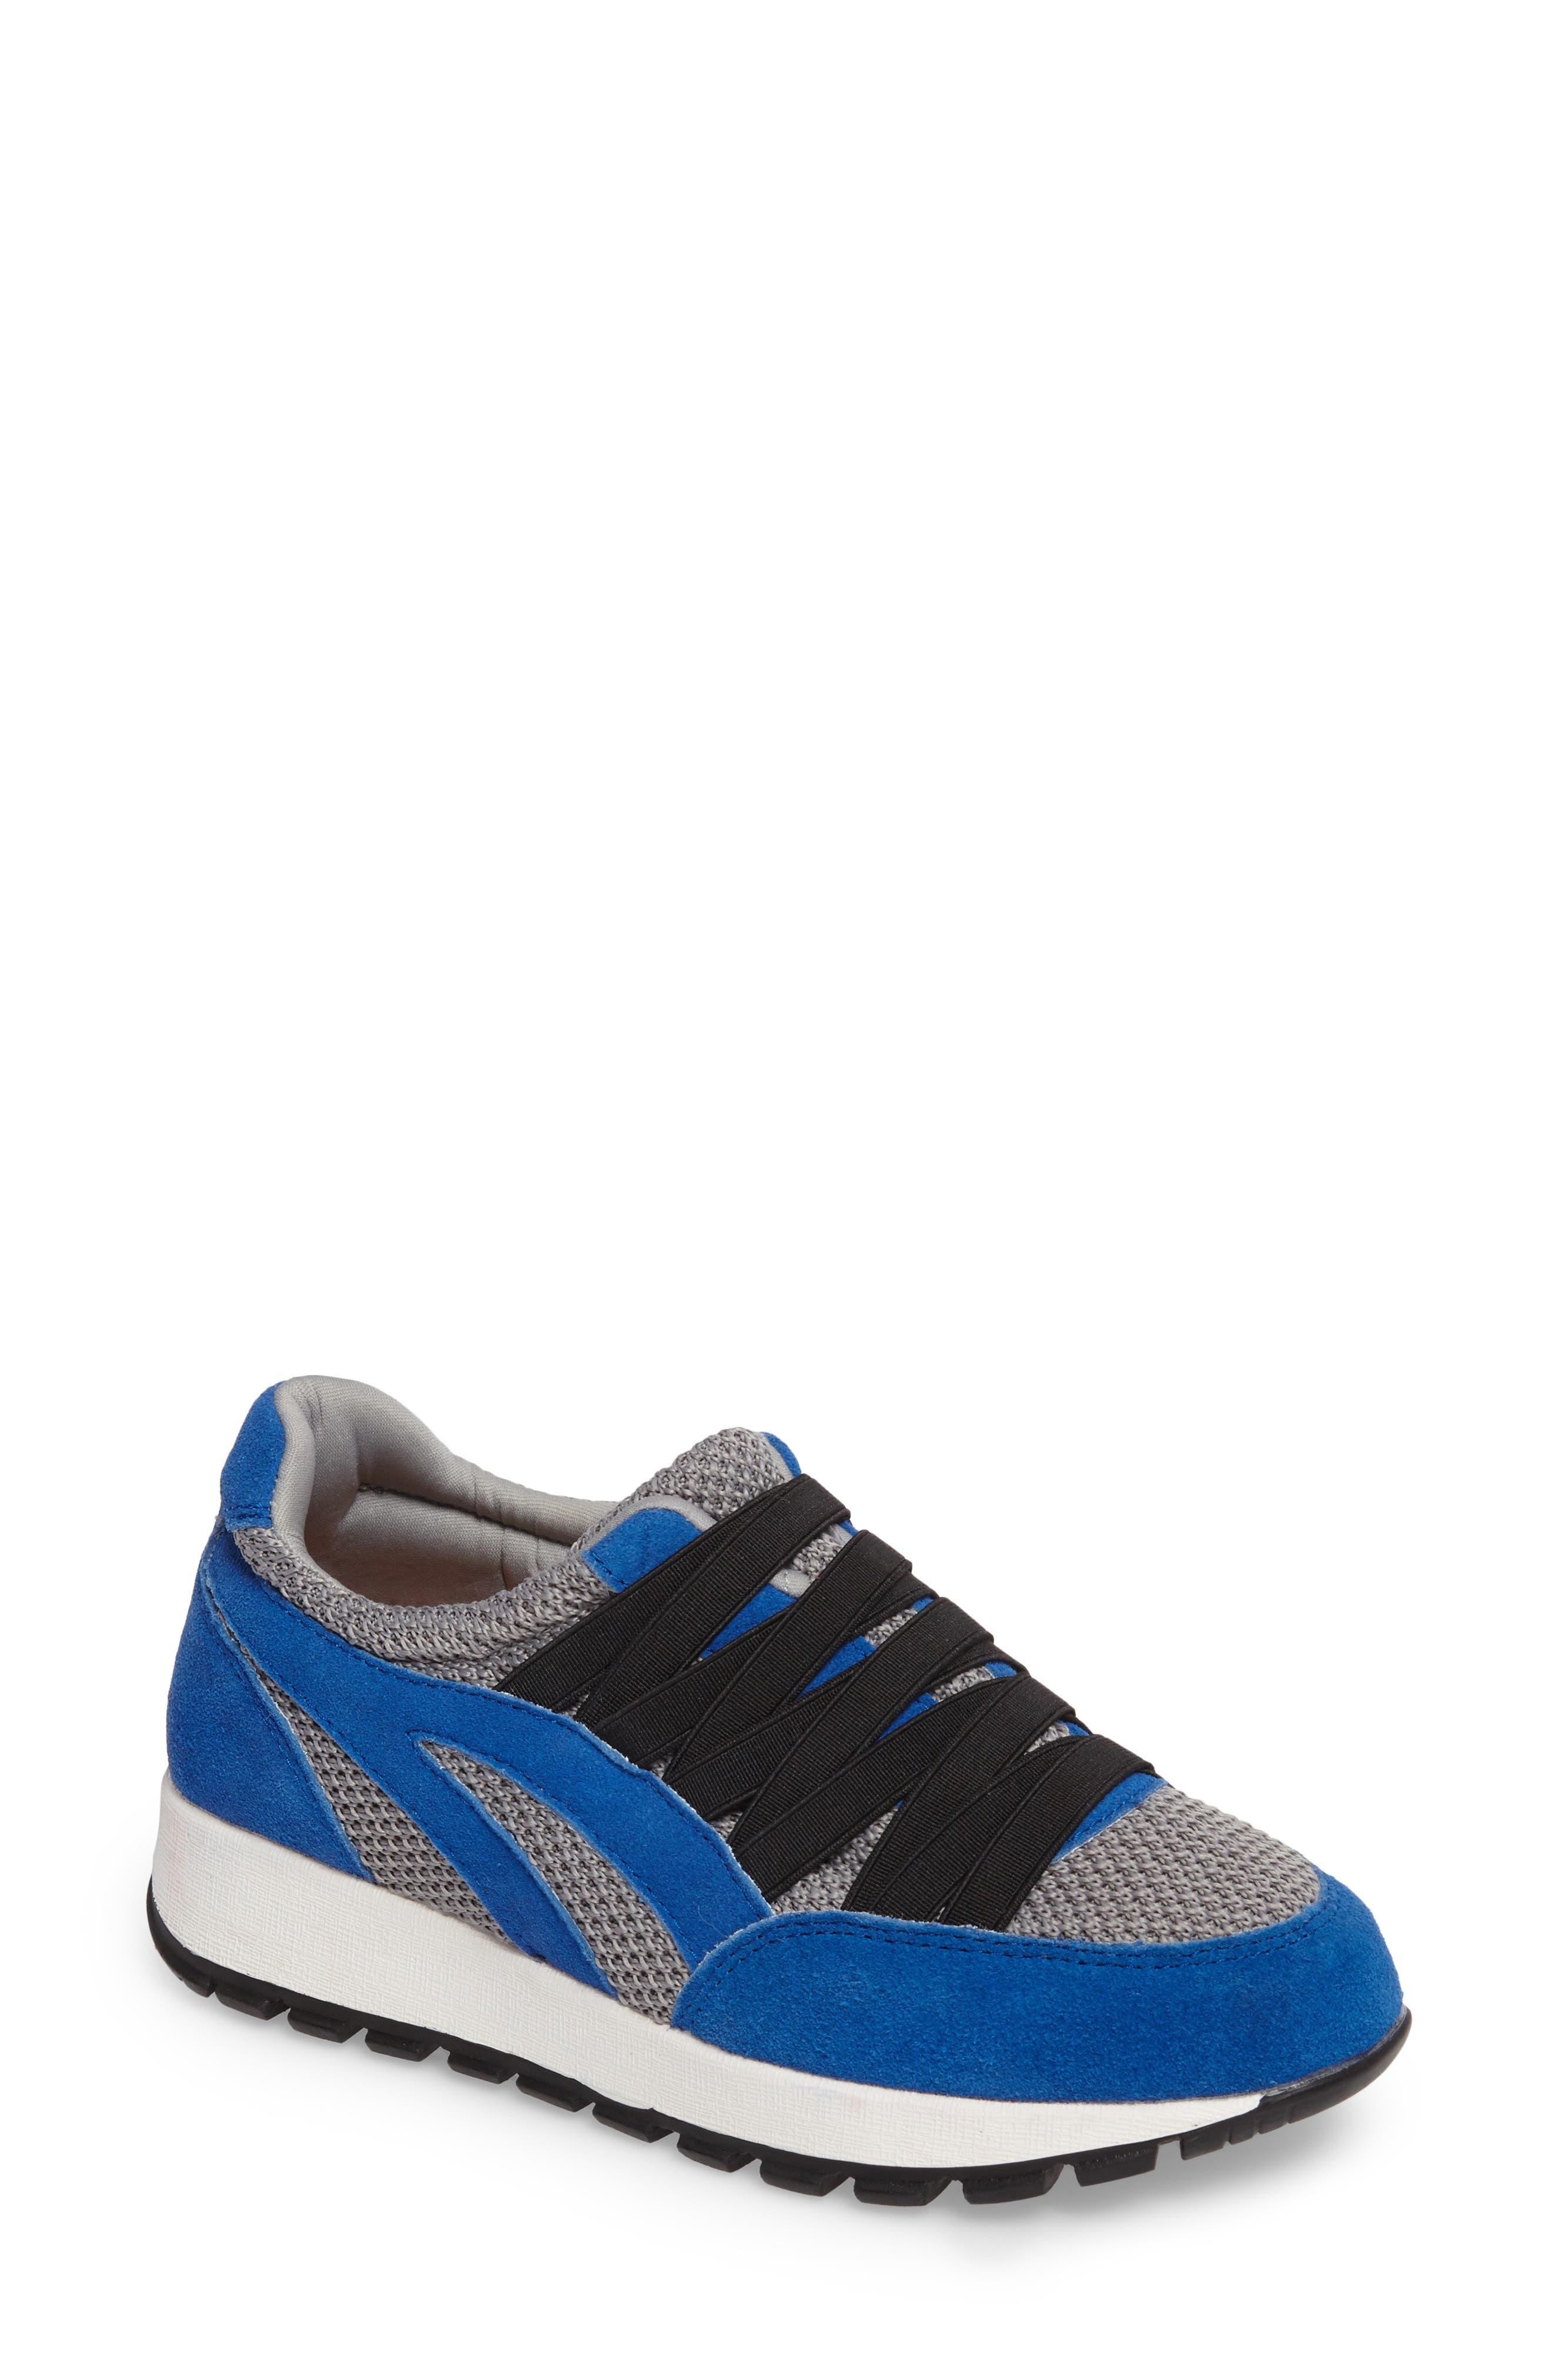 BERNIE MEV. Bernie Mev Tara Cano Sneaker, Main, color, ROYAL BLUE/ GREY FABRIC